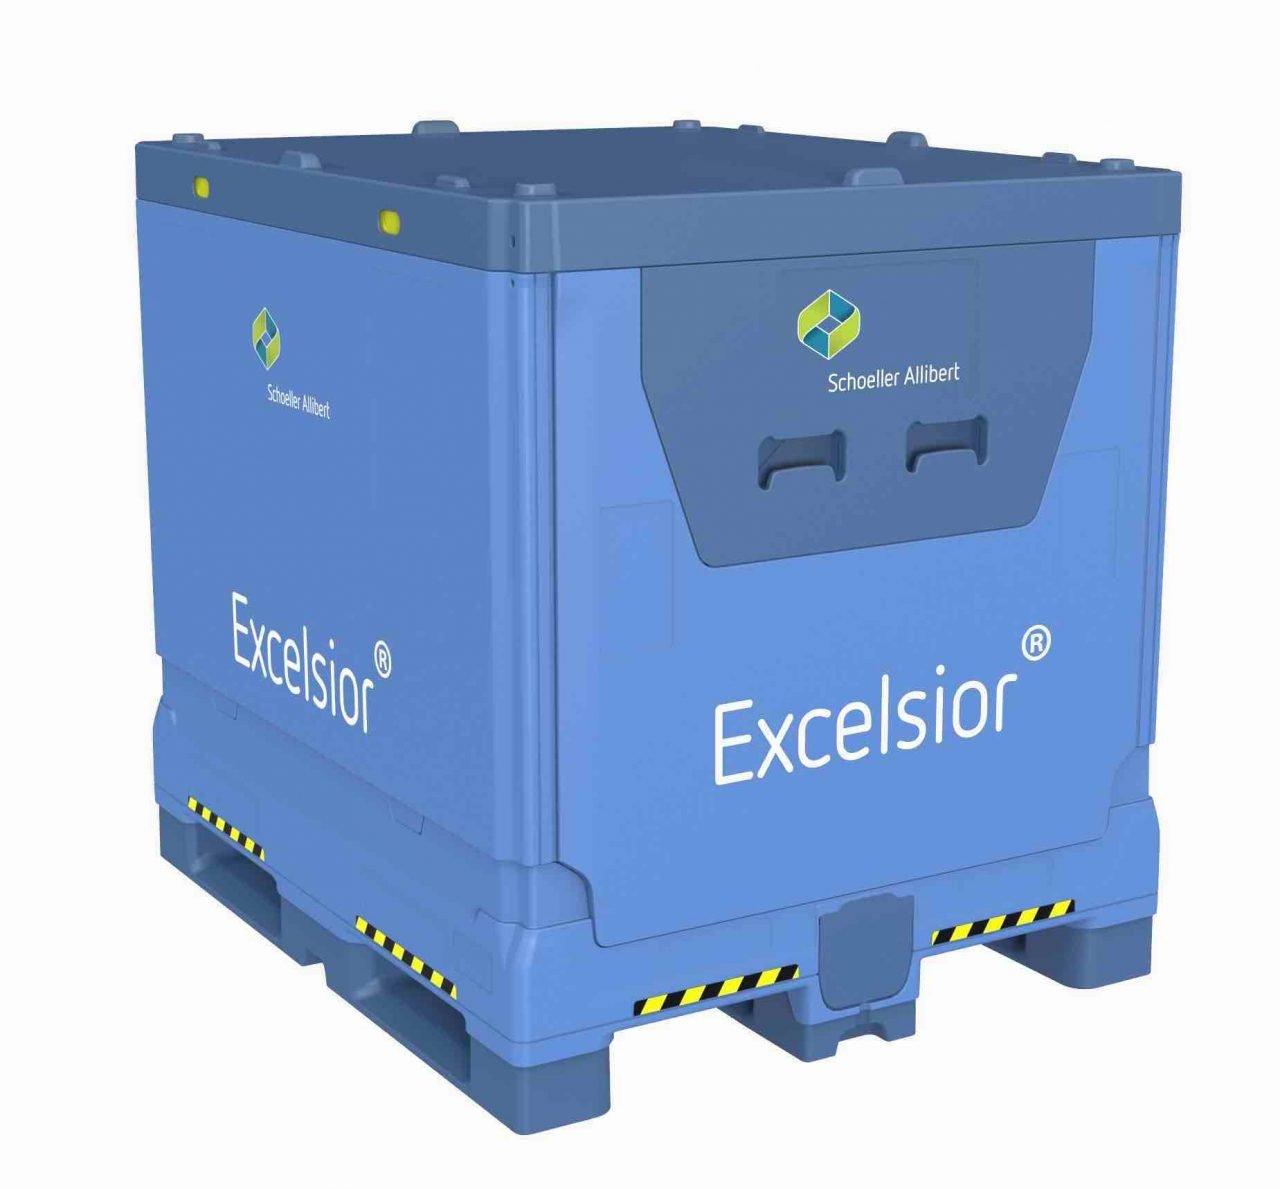 Schoeller_Excelsior-1280x1189.jpg